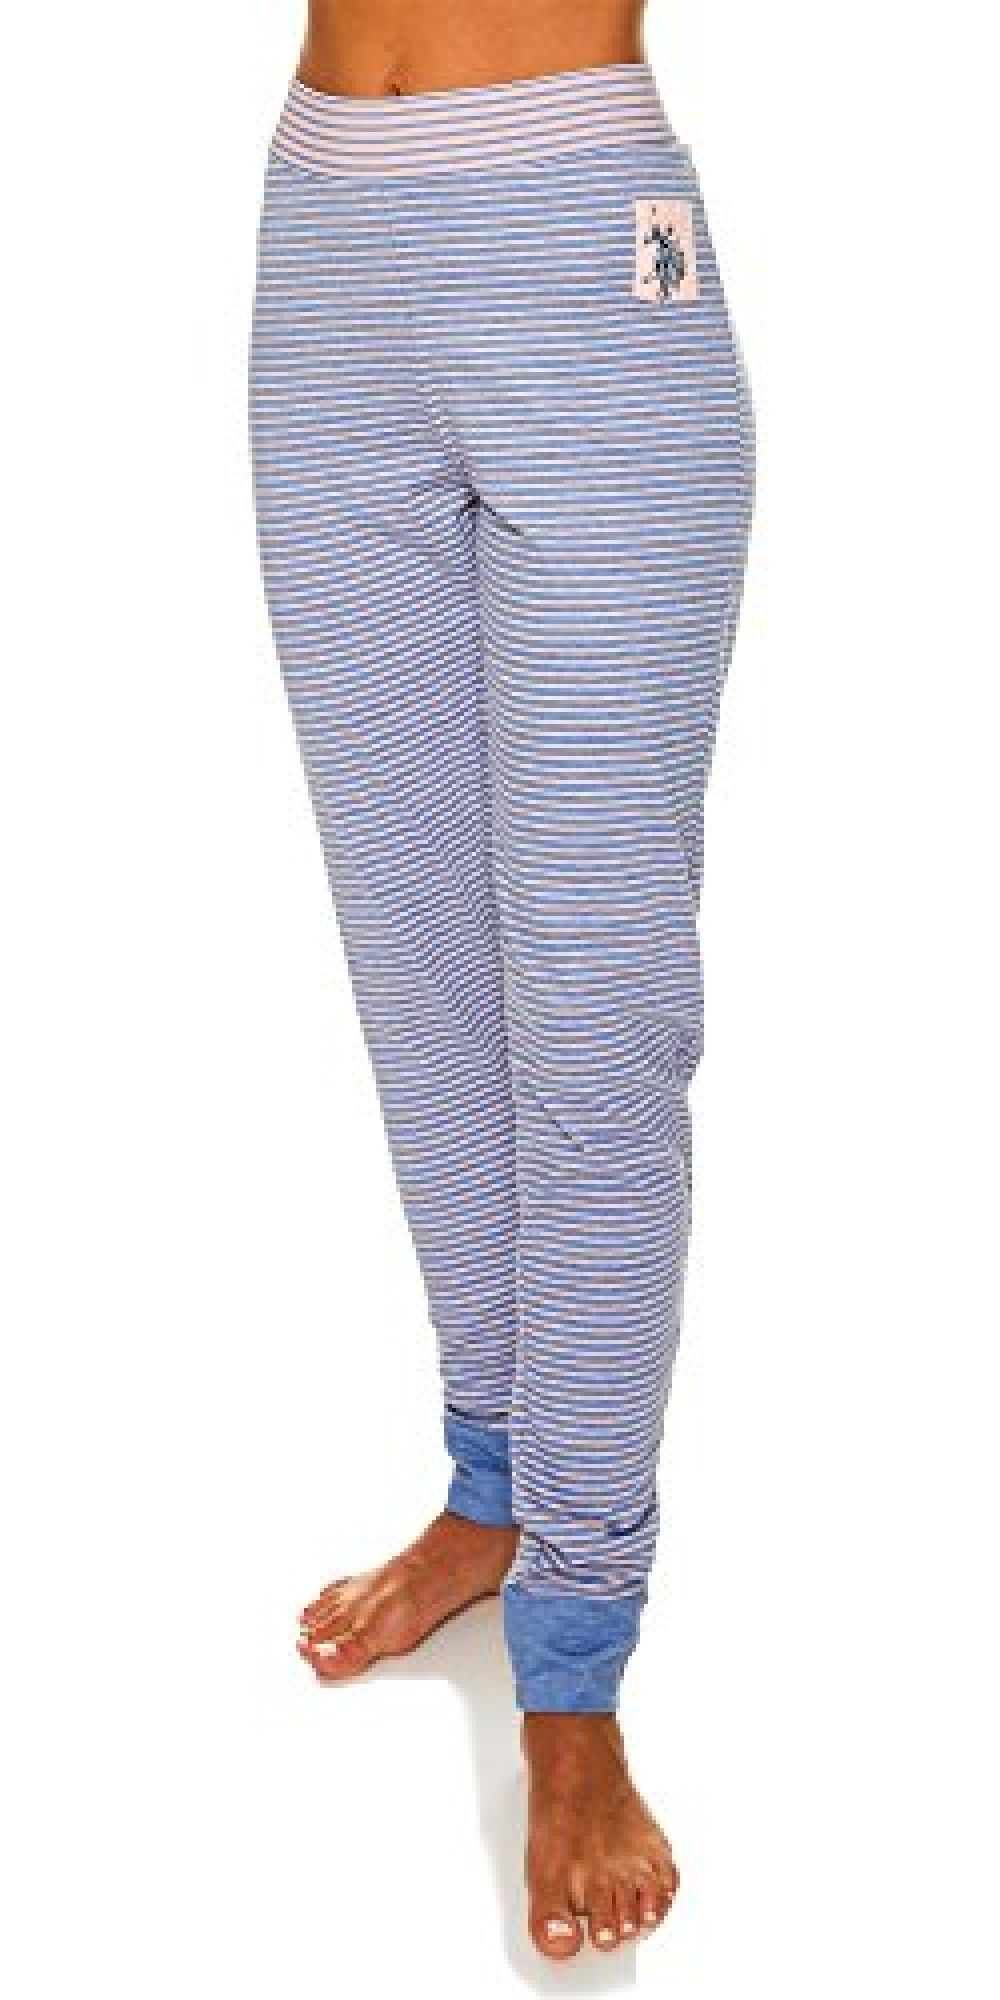 U.S Polo Assn Womens Elastic Waistband Lounge//Pajama Sleep Shorts